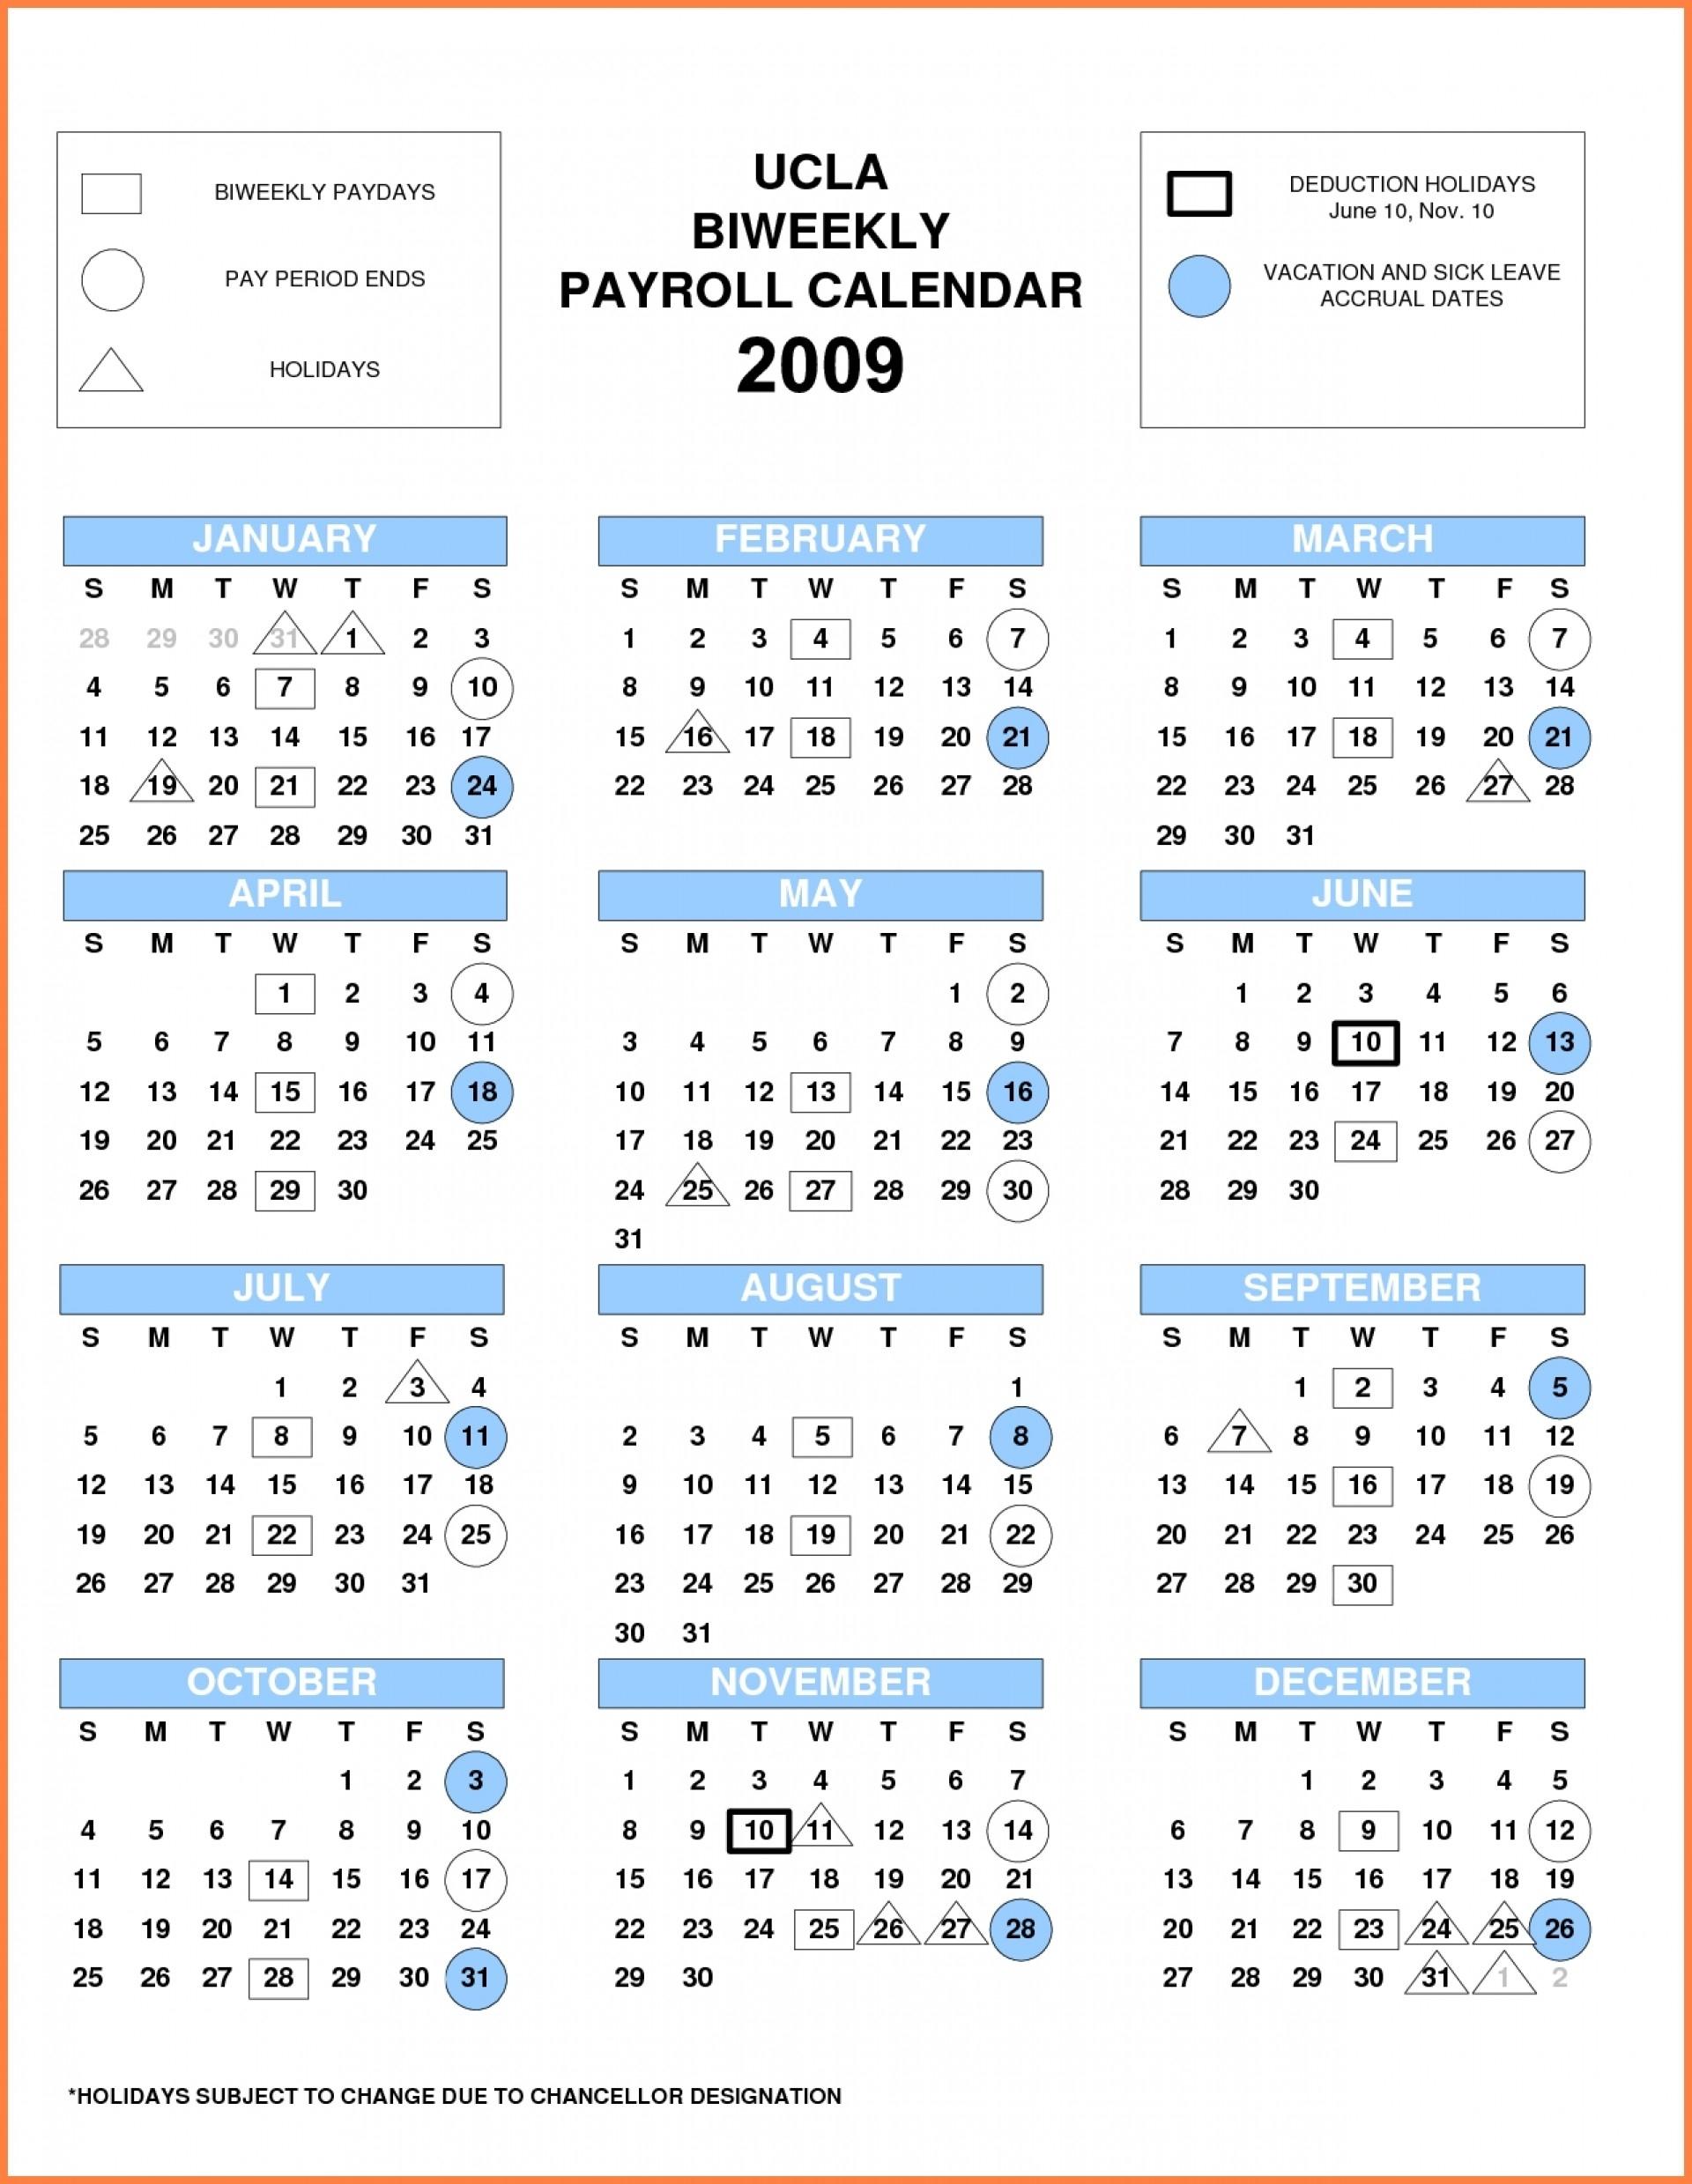 2020 Biweekly Payroll Calendar Printable | Payroll Calendar 2020-Payroll Calendar Template 2020